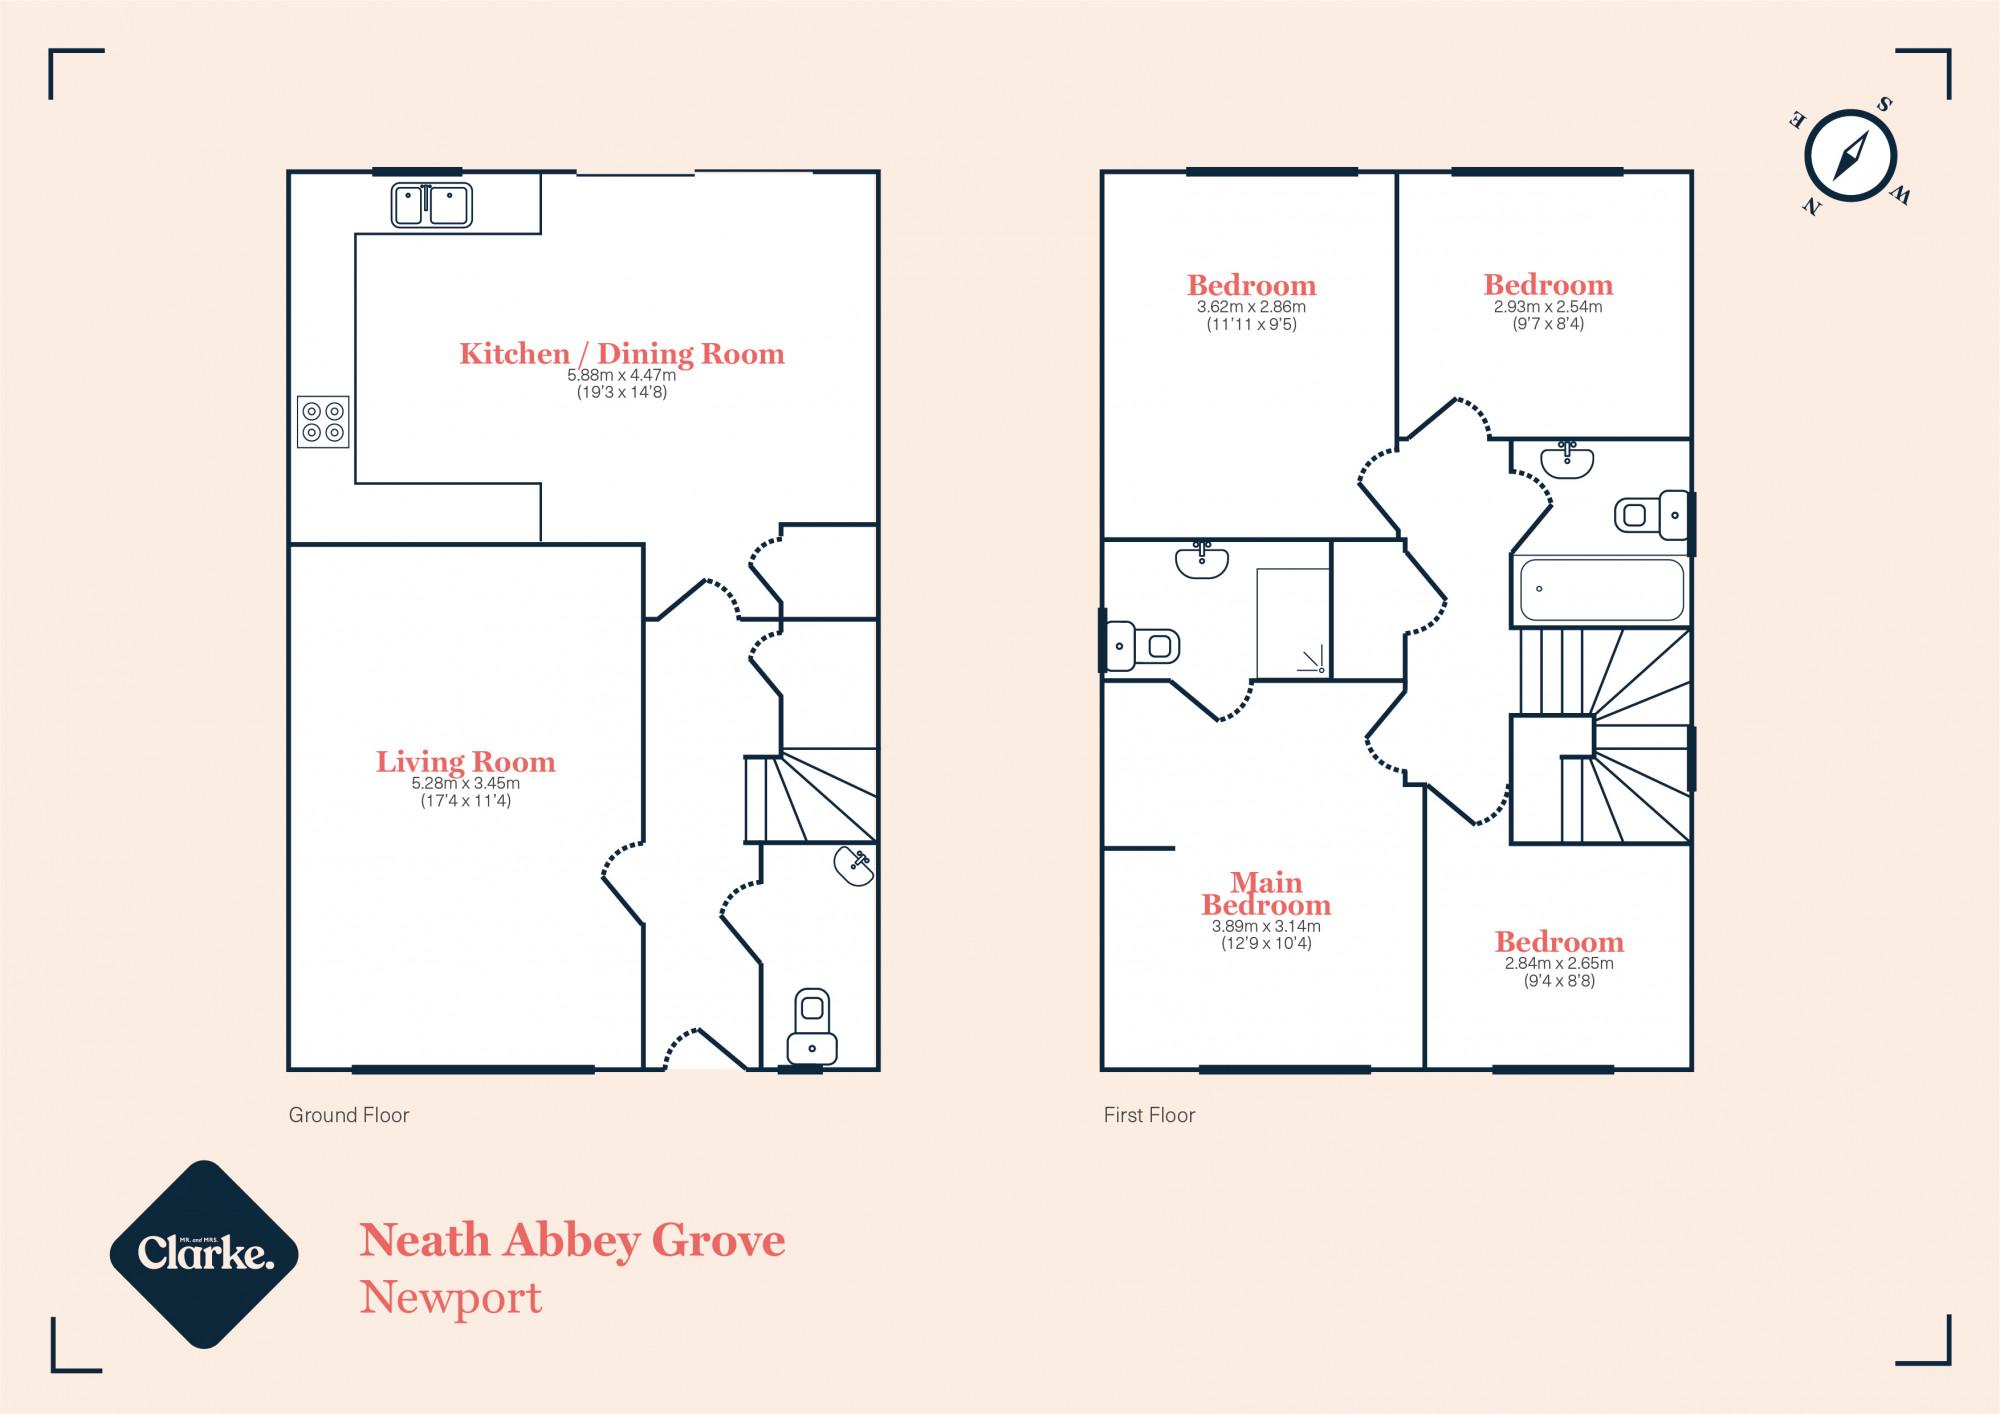 Neath Abbey Grove, Newport. Floorplan.